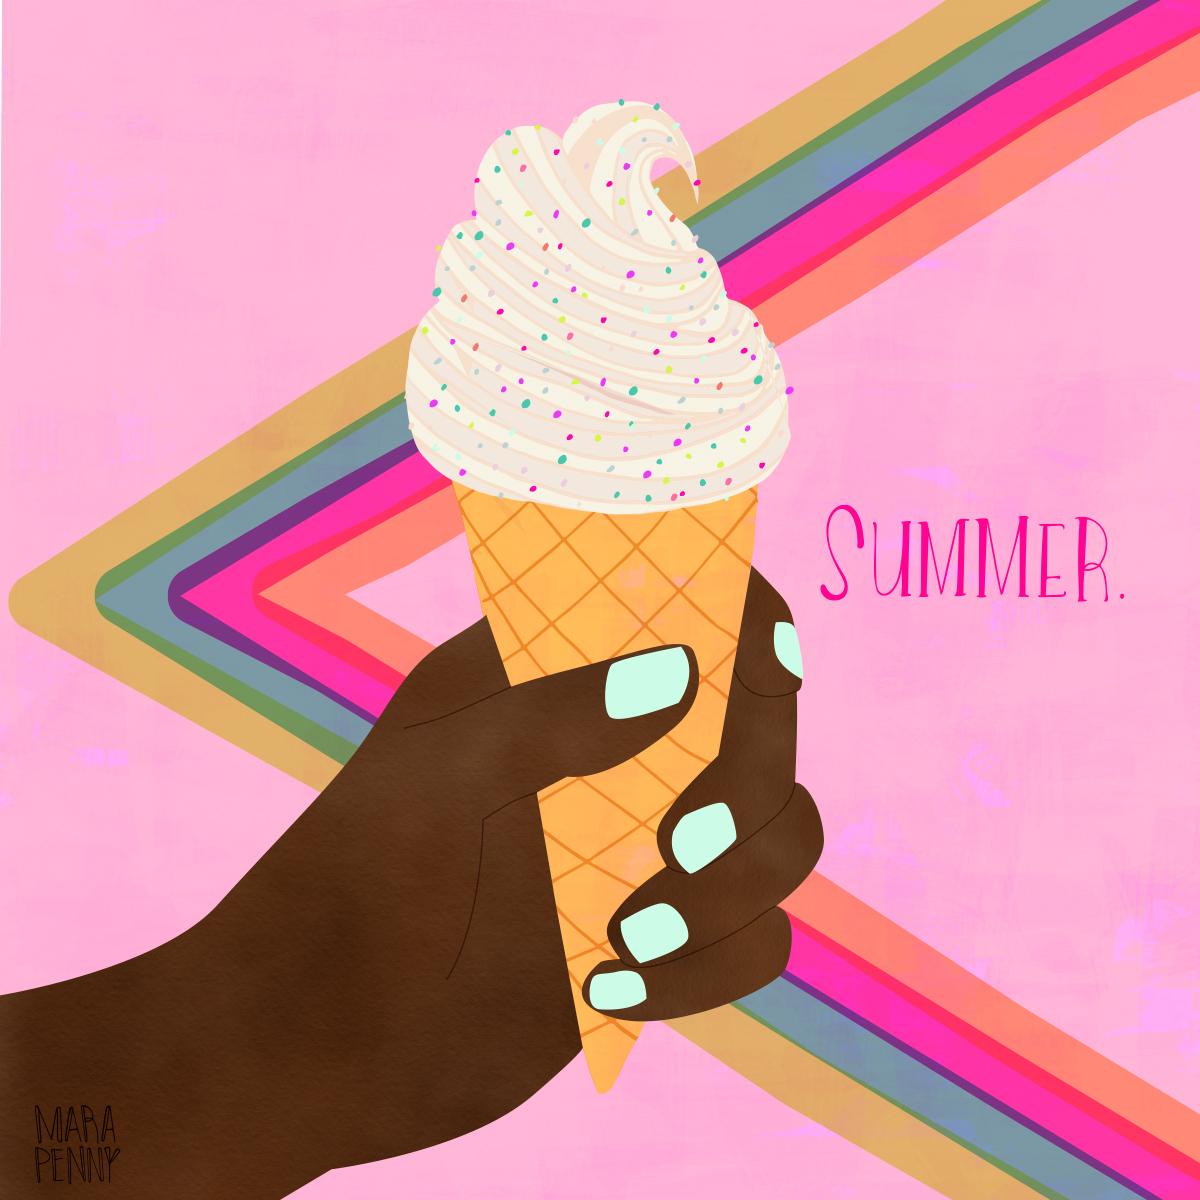 penny_PP_summer-ice-cream.jpg